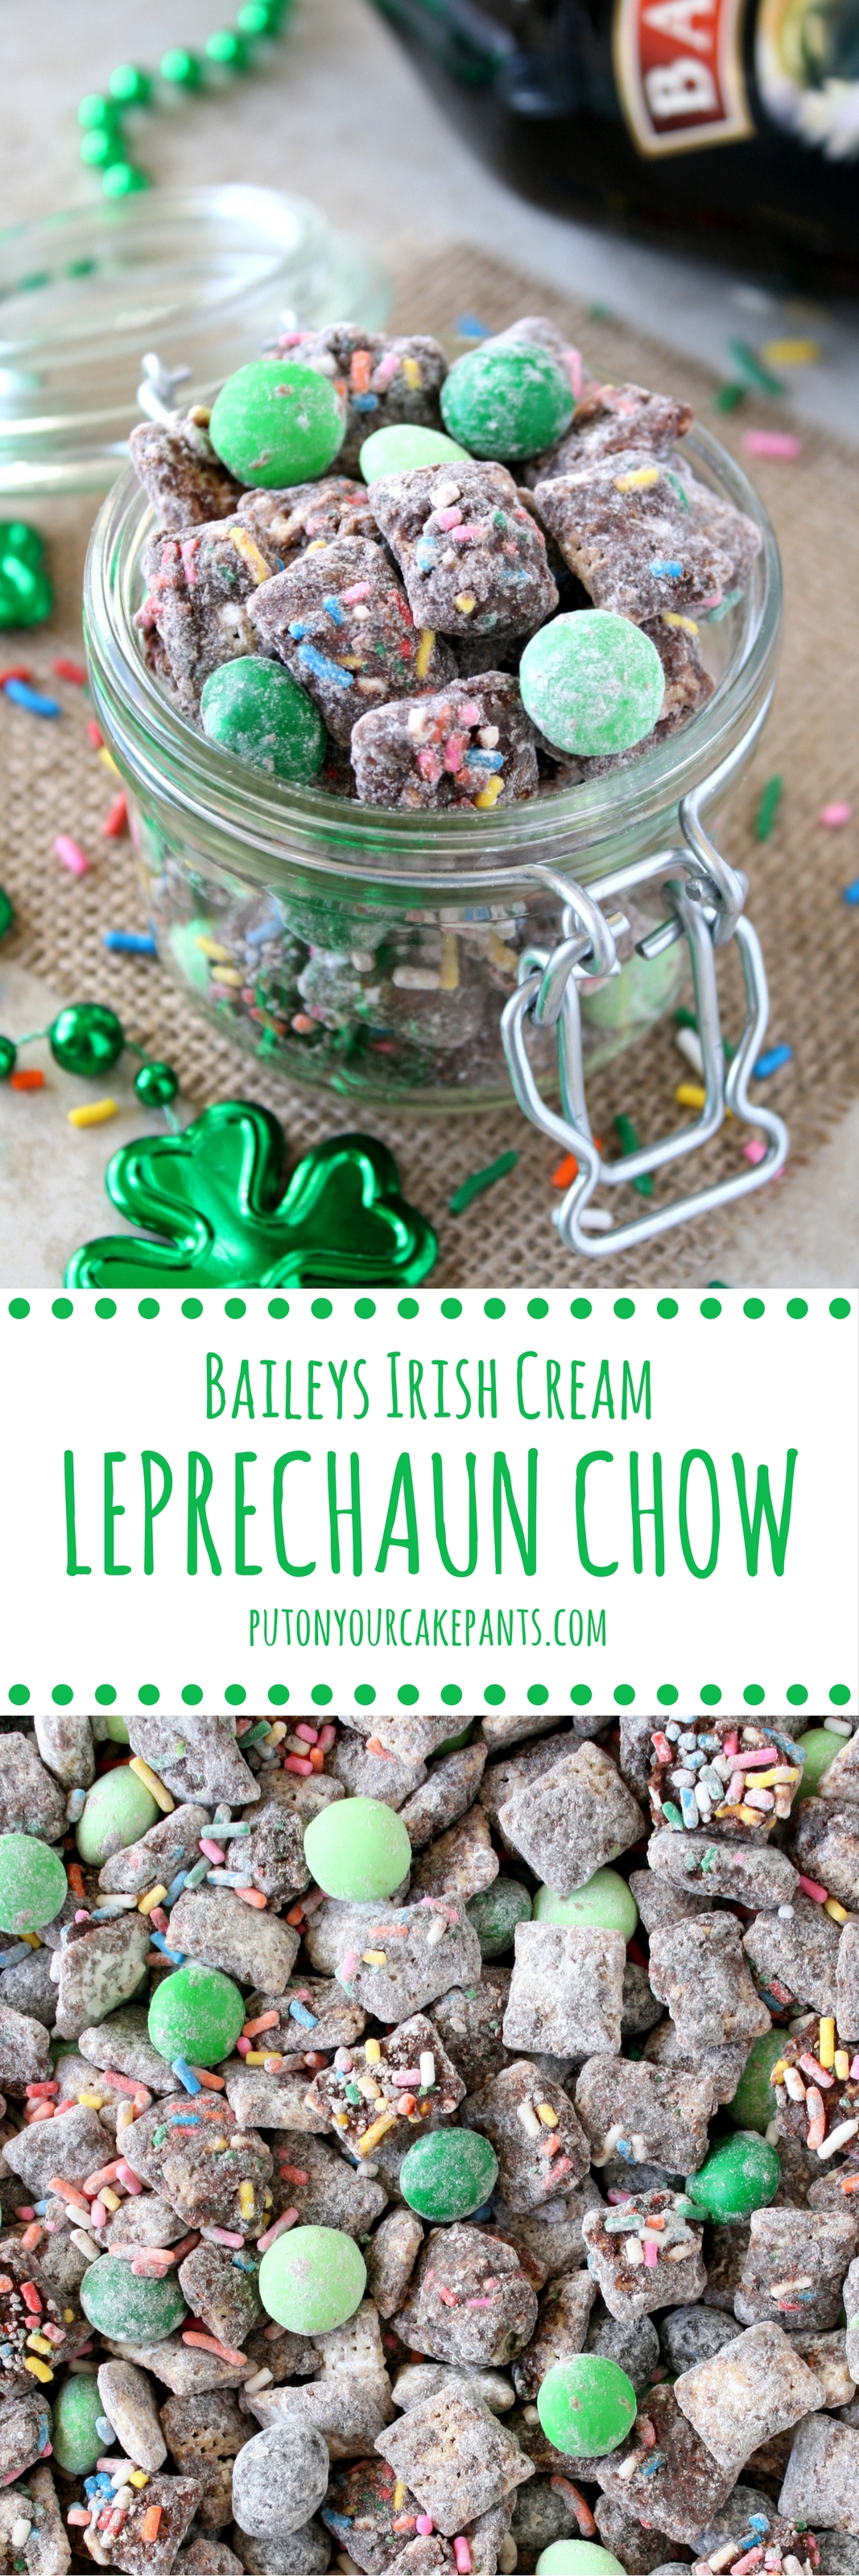 Baileys leprechaun chow